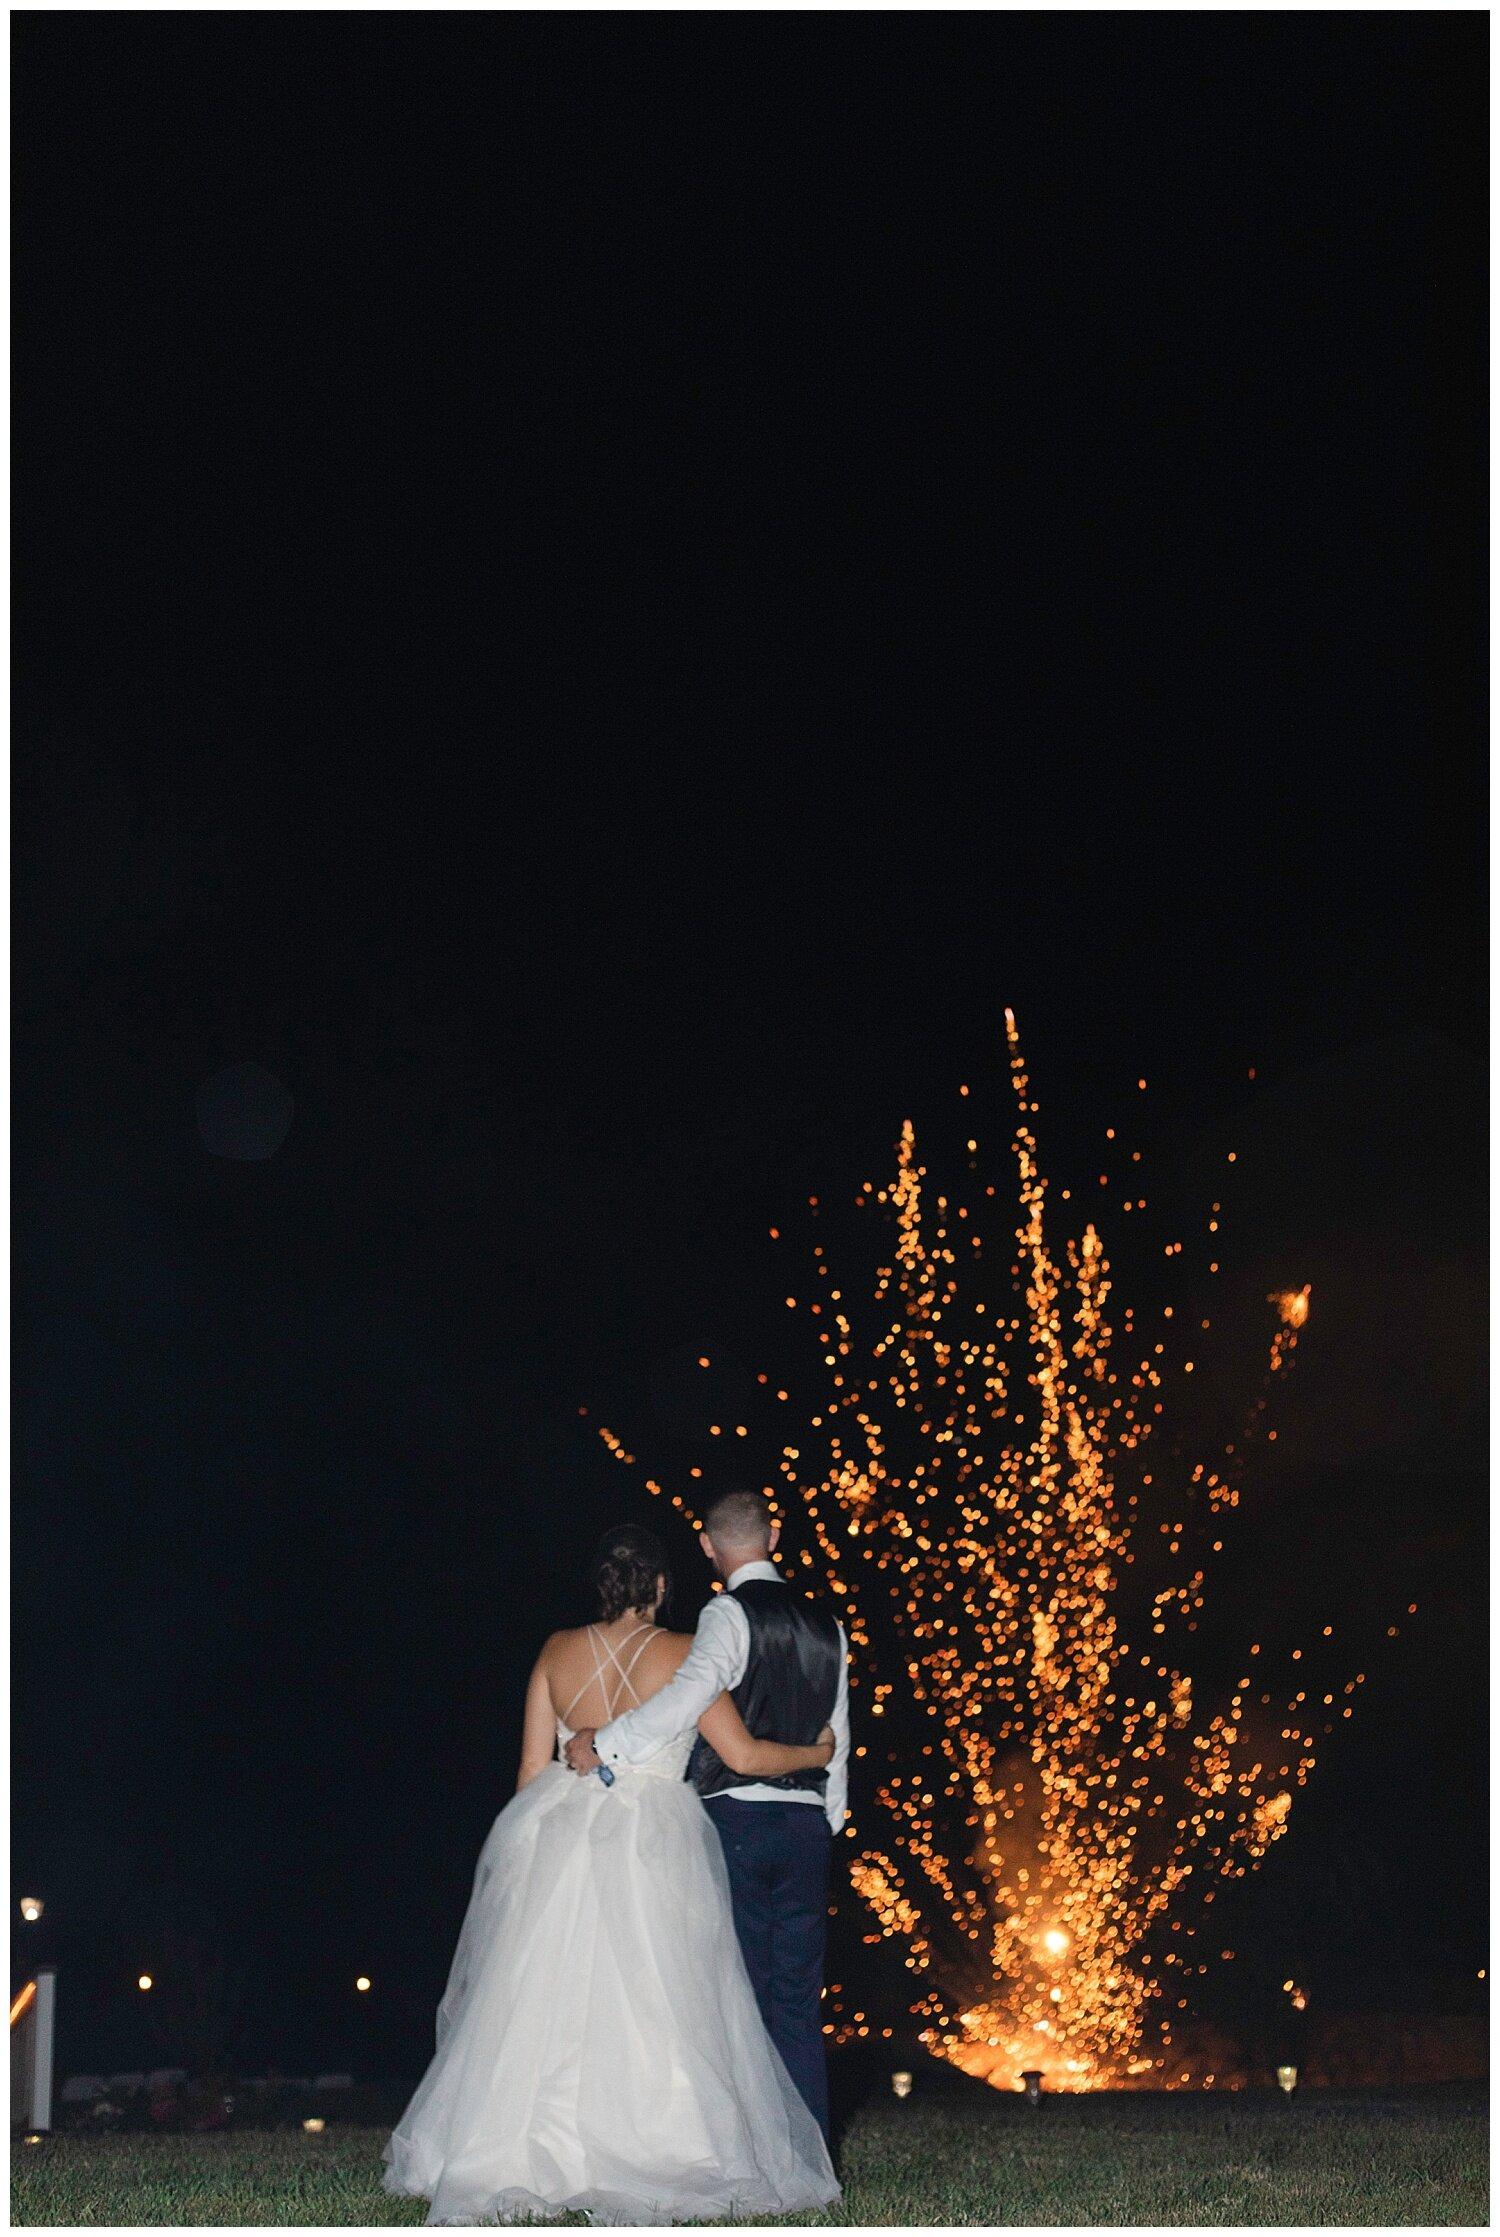 MJMP Richmond VA Wedding Photographer The Venue at Orchard View Farm Wedding Photo_0077.jpg